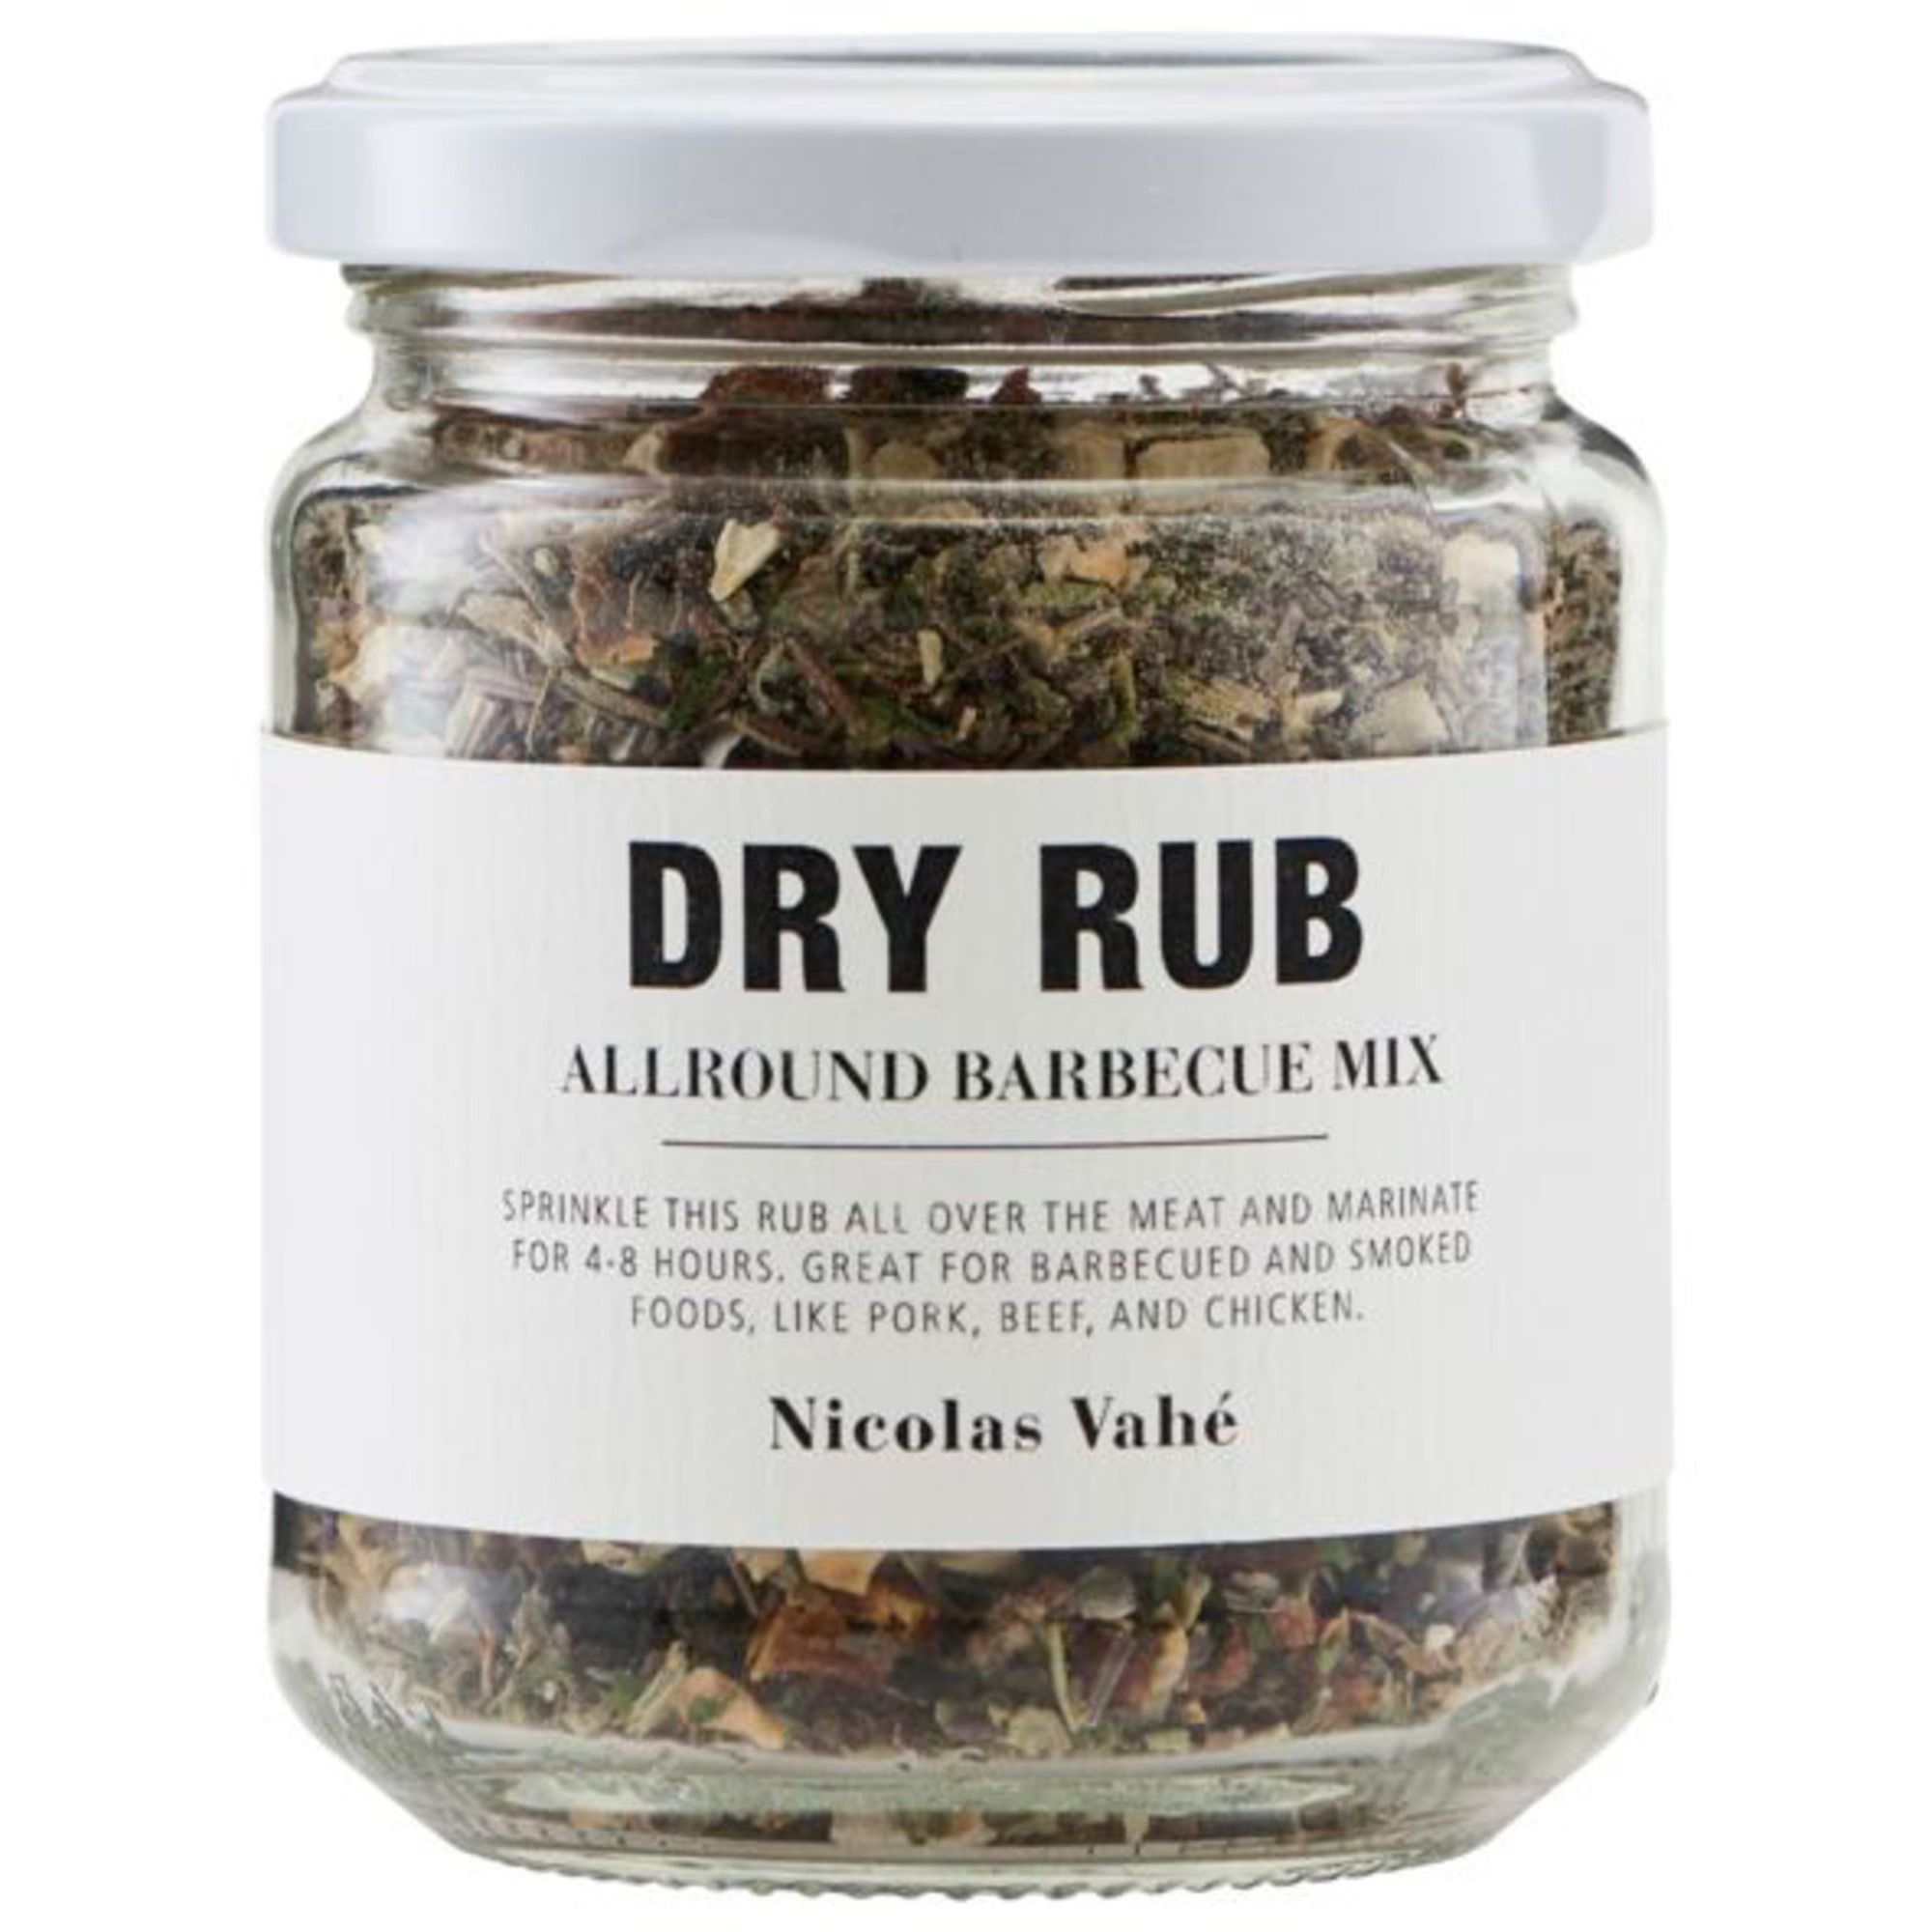 Nicolas Vahé Dry rub Allround barbecue mix